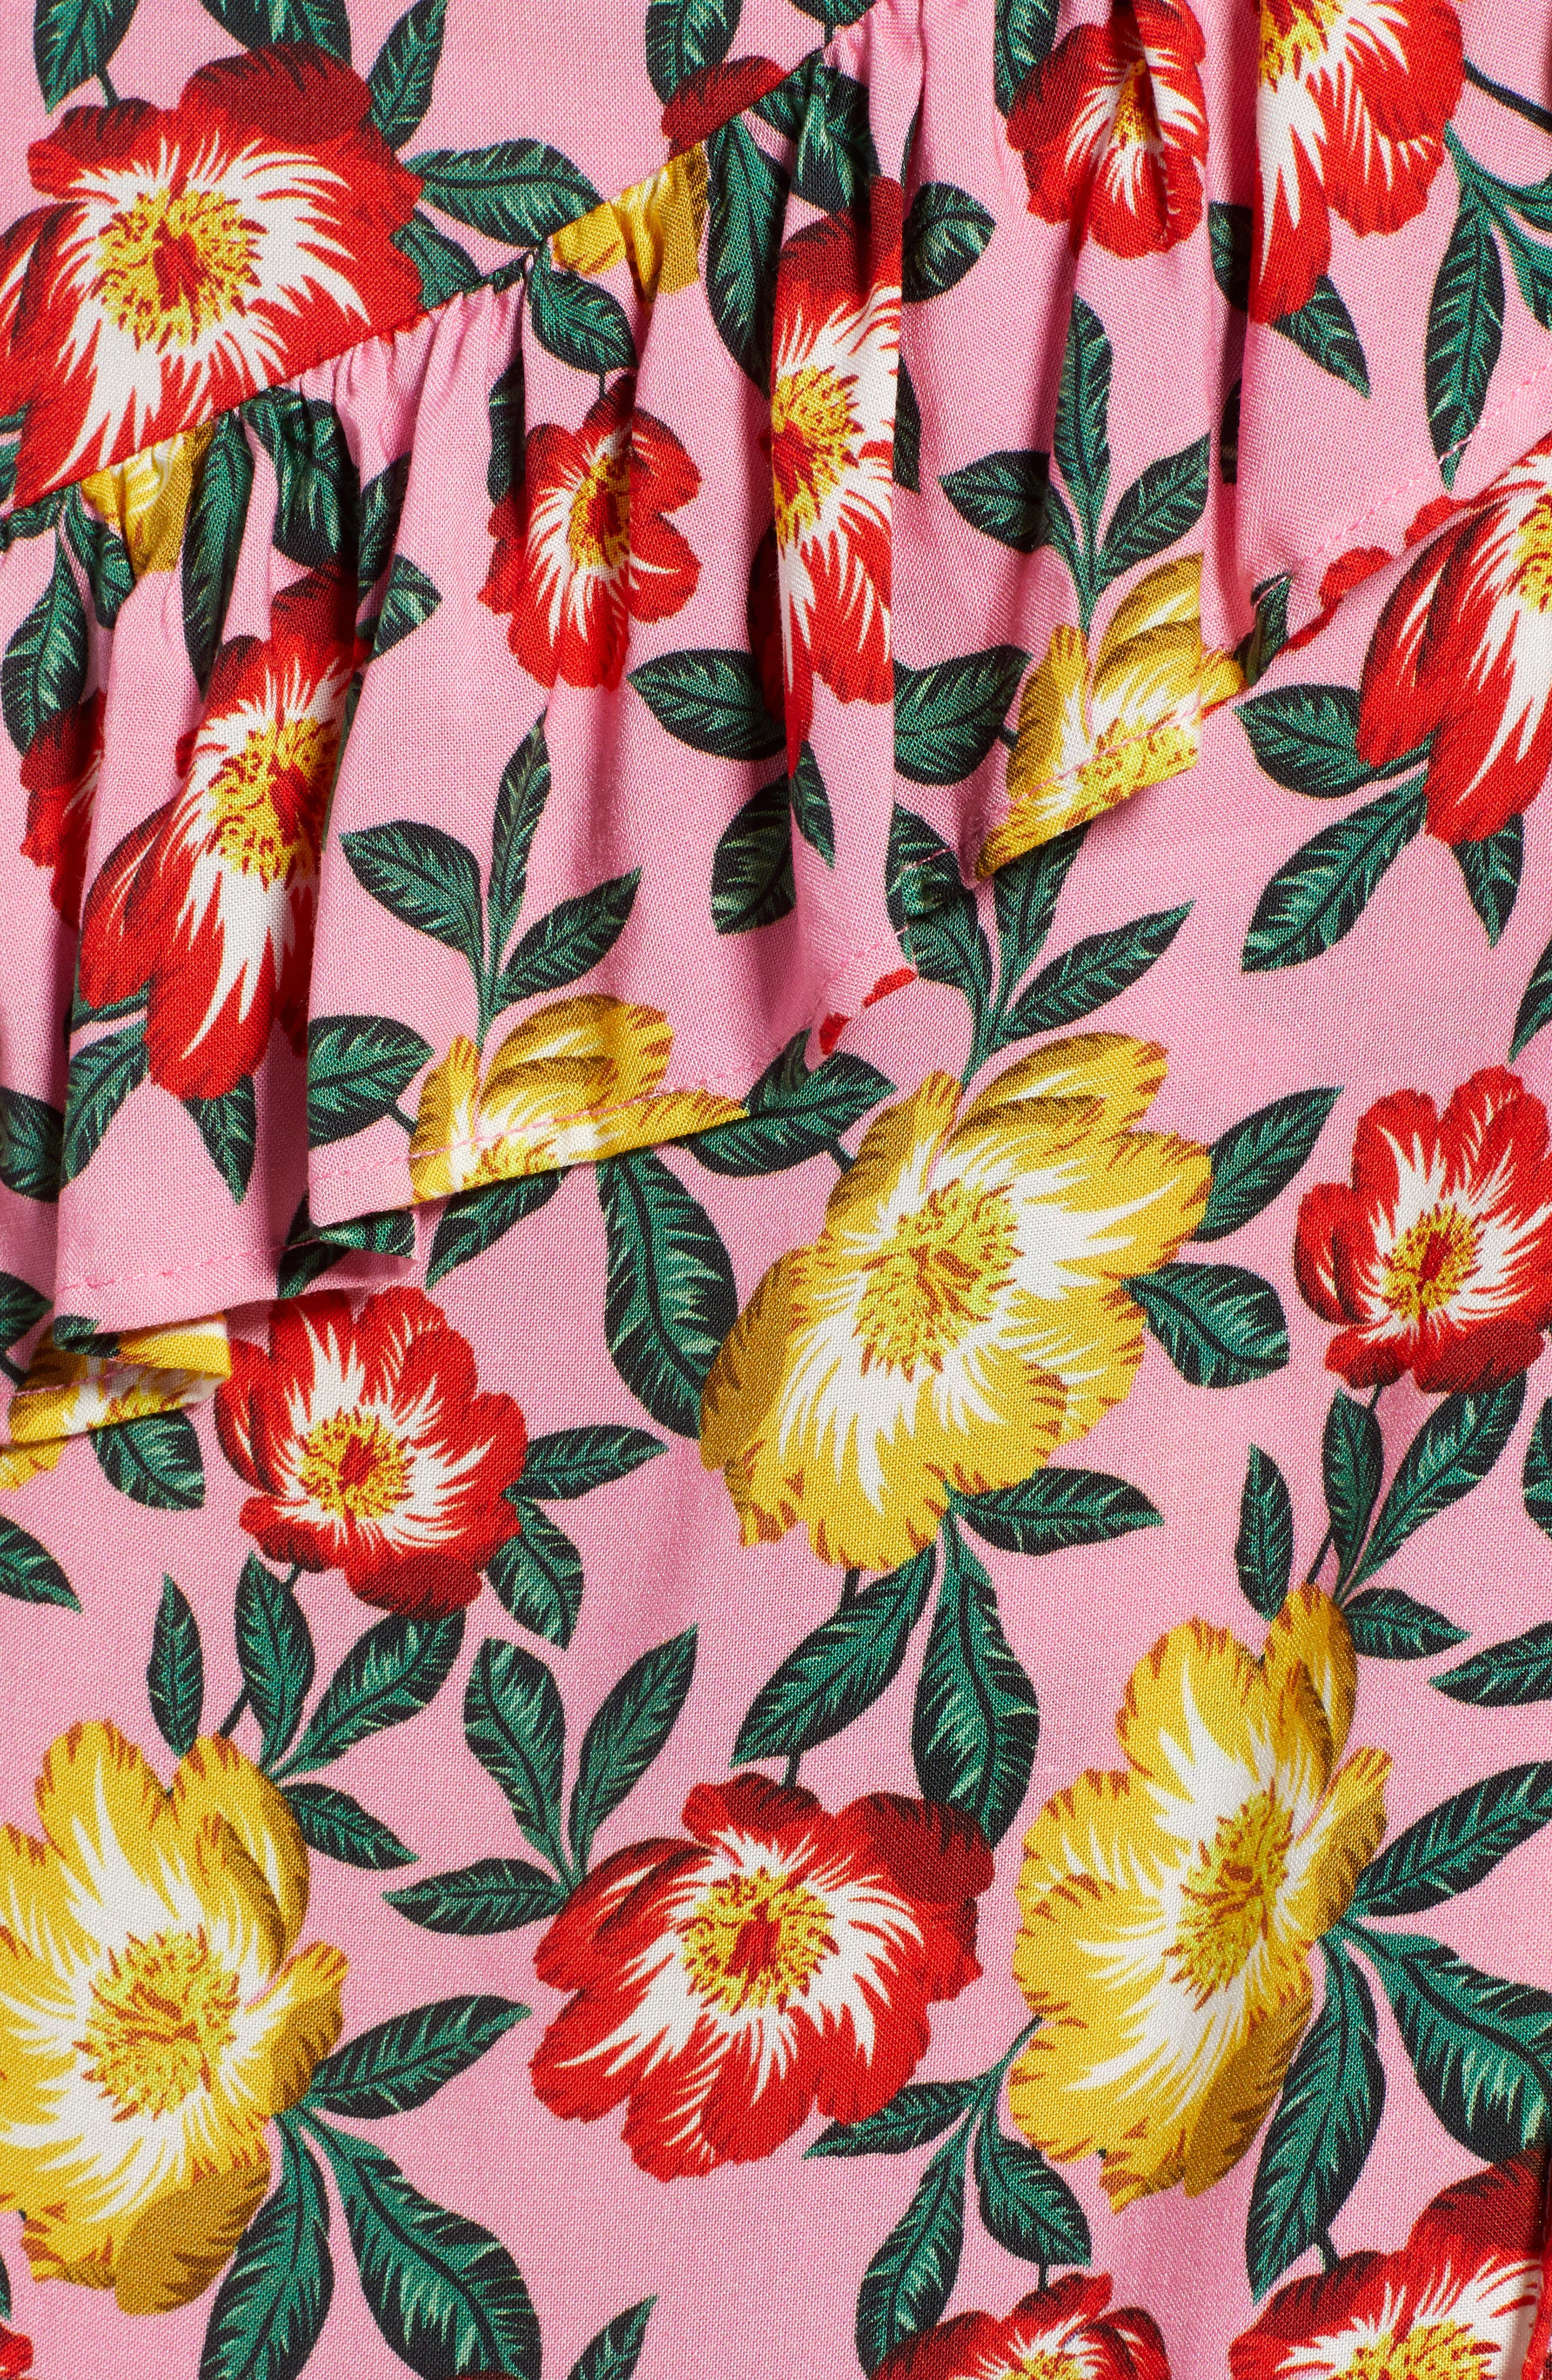 Reunion Floral Print Wrap Skirt,                             Alternate thumbnail 5, color,                             650